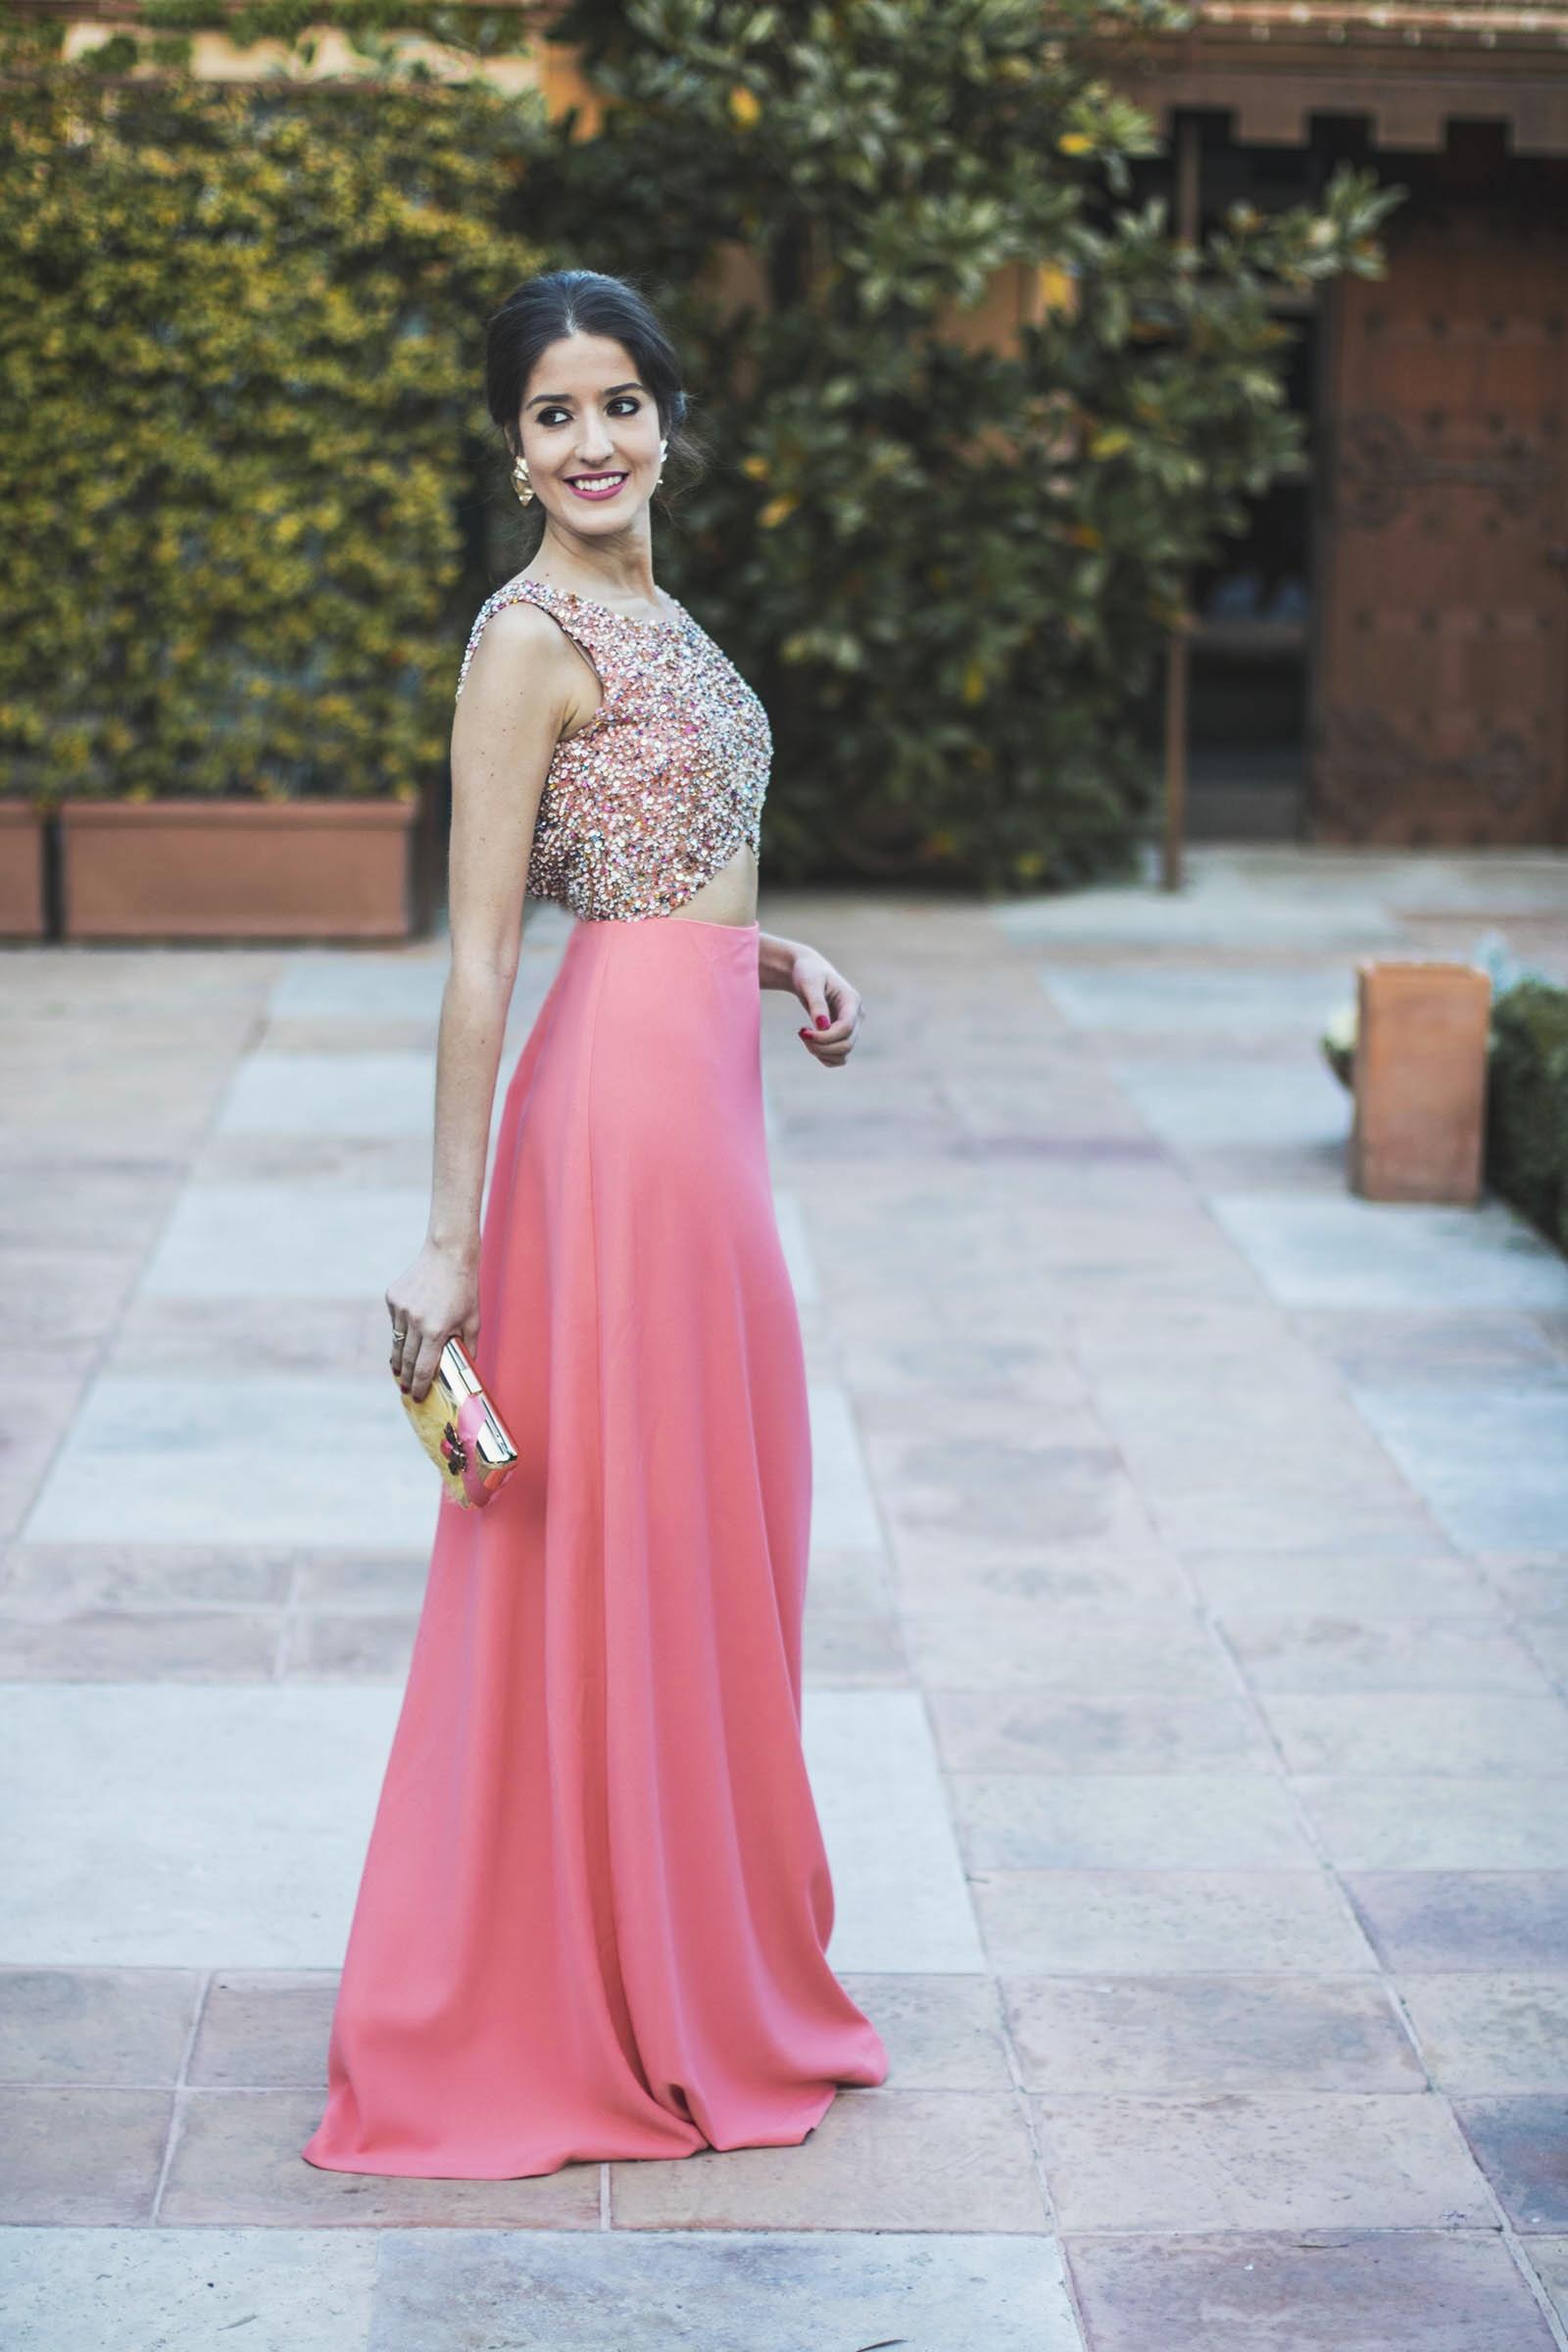 Vestidos para bodas de noche invitadas – Vestidos de noche de moda ...